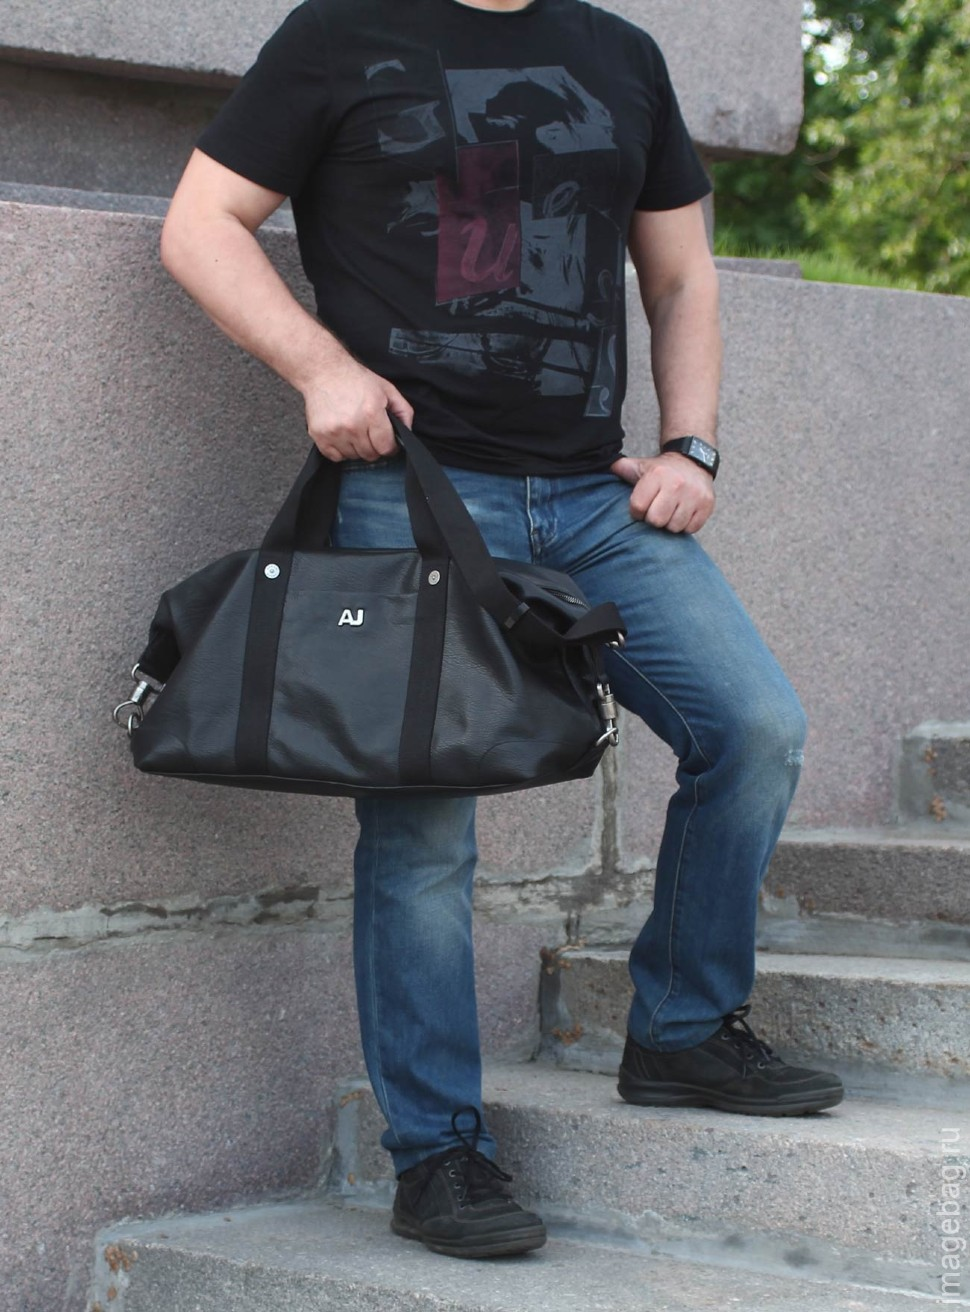 f4f7e4f77b26 Сумка кожаная для фитнеса Armani 078006-366 купить в Казани по супер ...